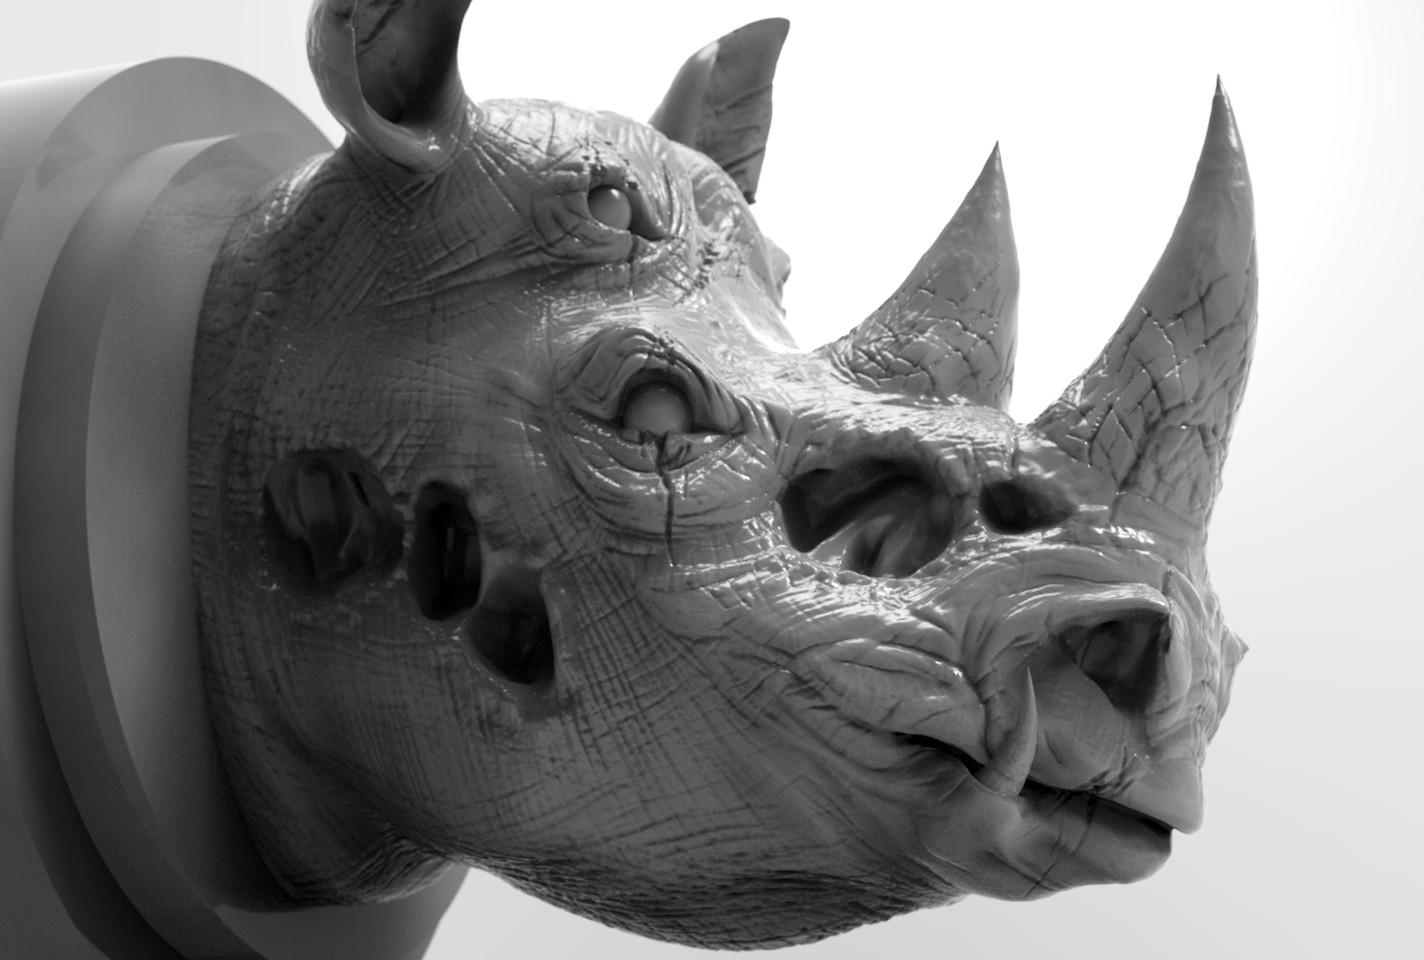 Danger Rhino